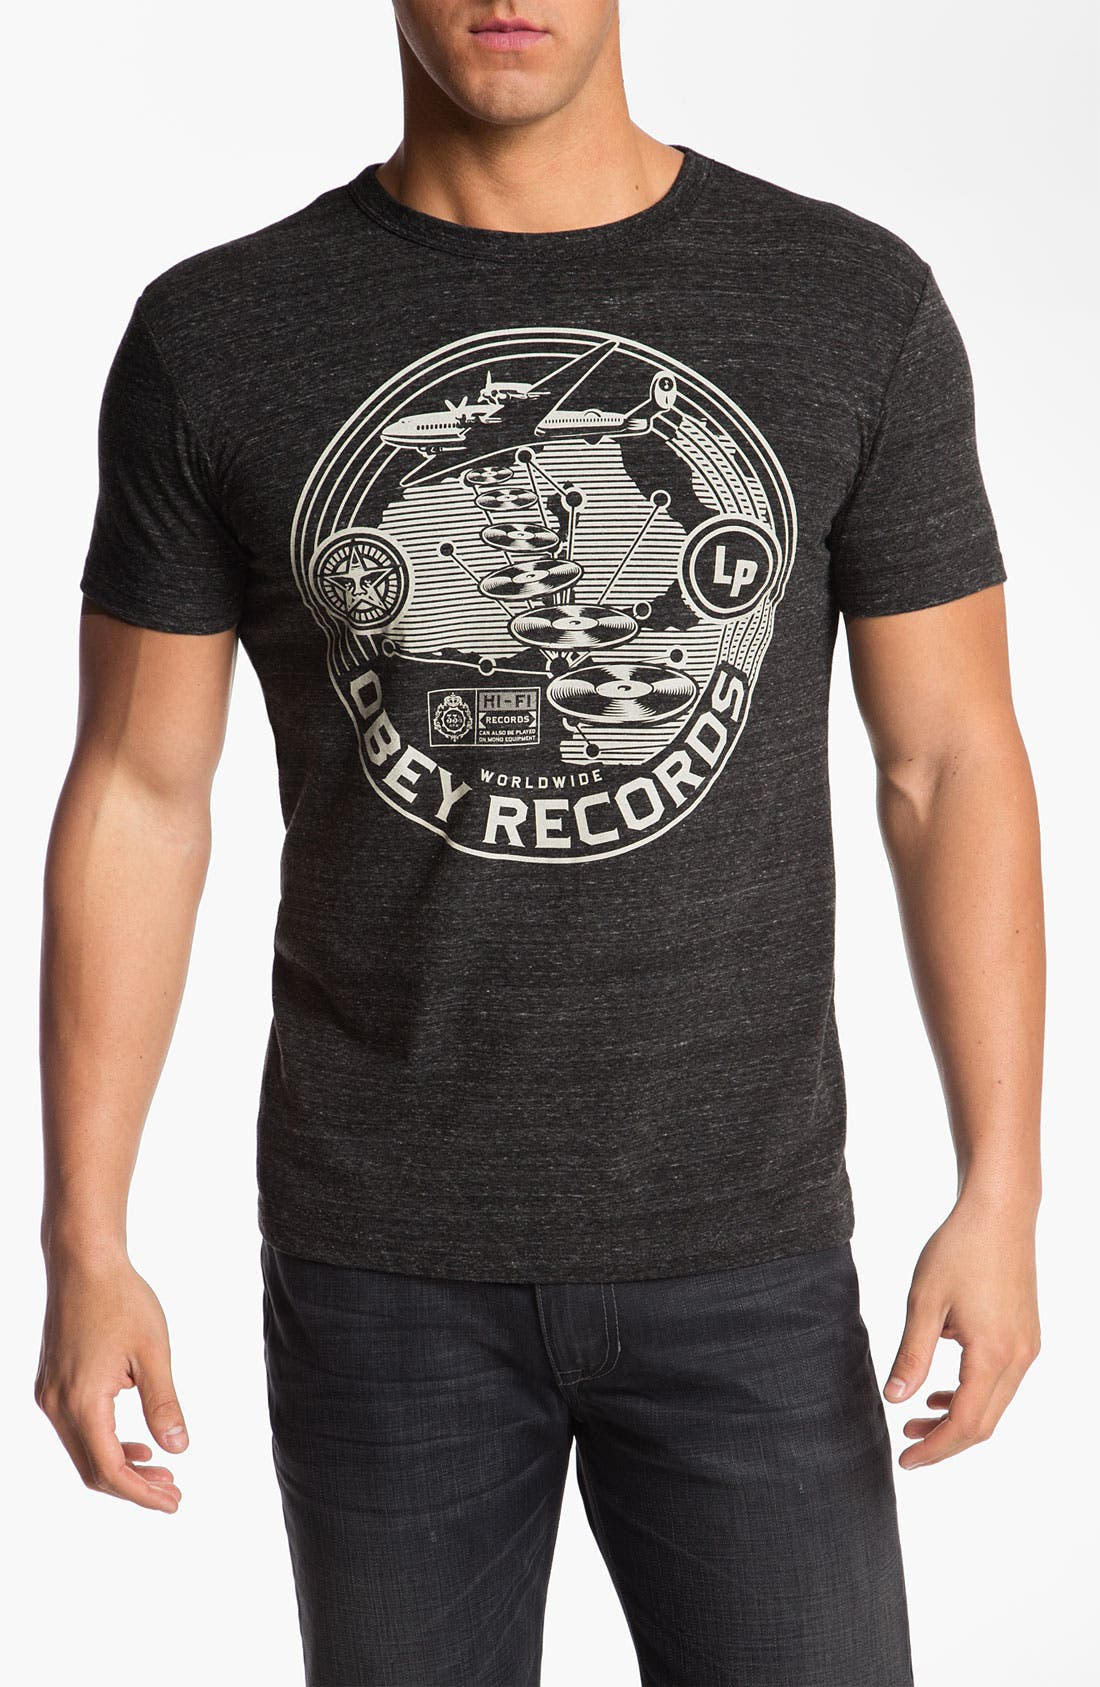 Main Image - Obey 'Hi-Fi Records' Graphic Crewneck T-Shirt